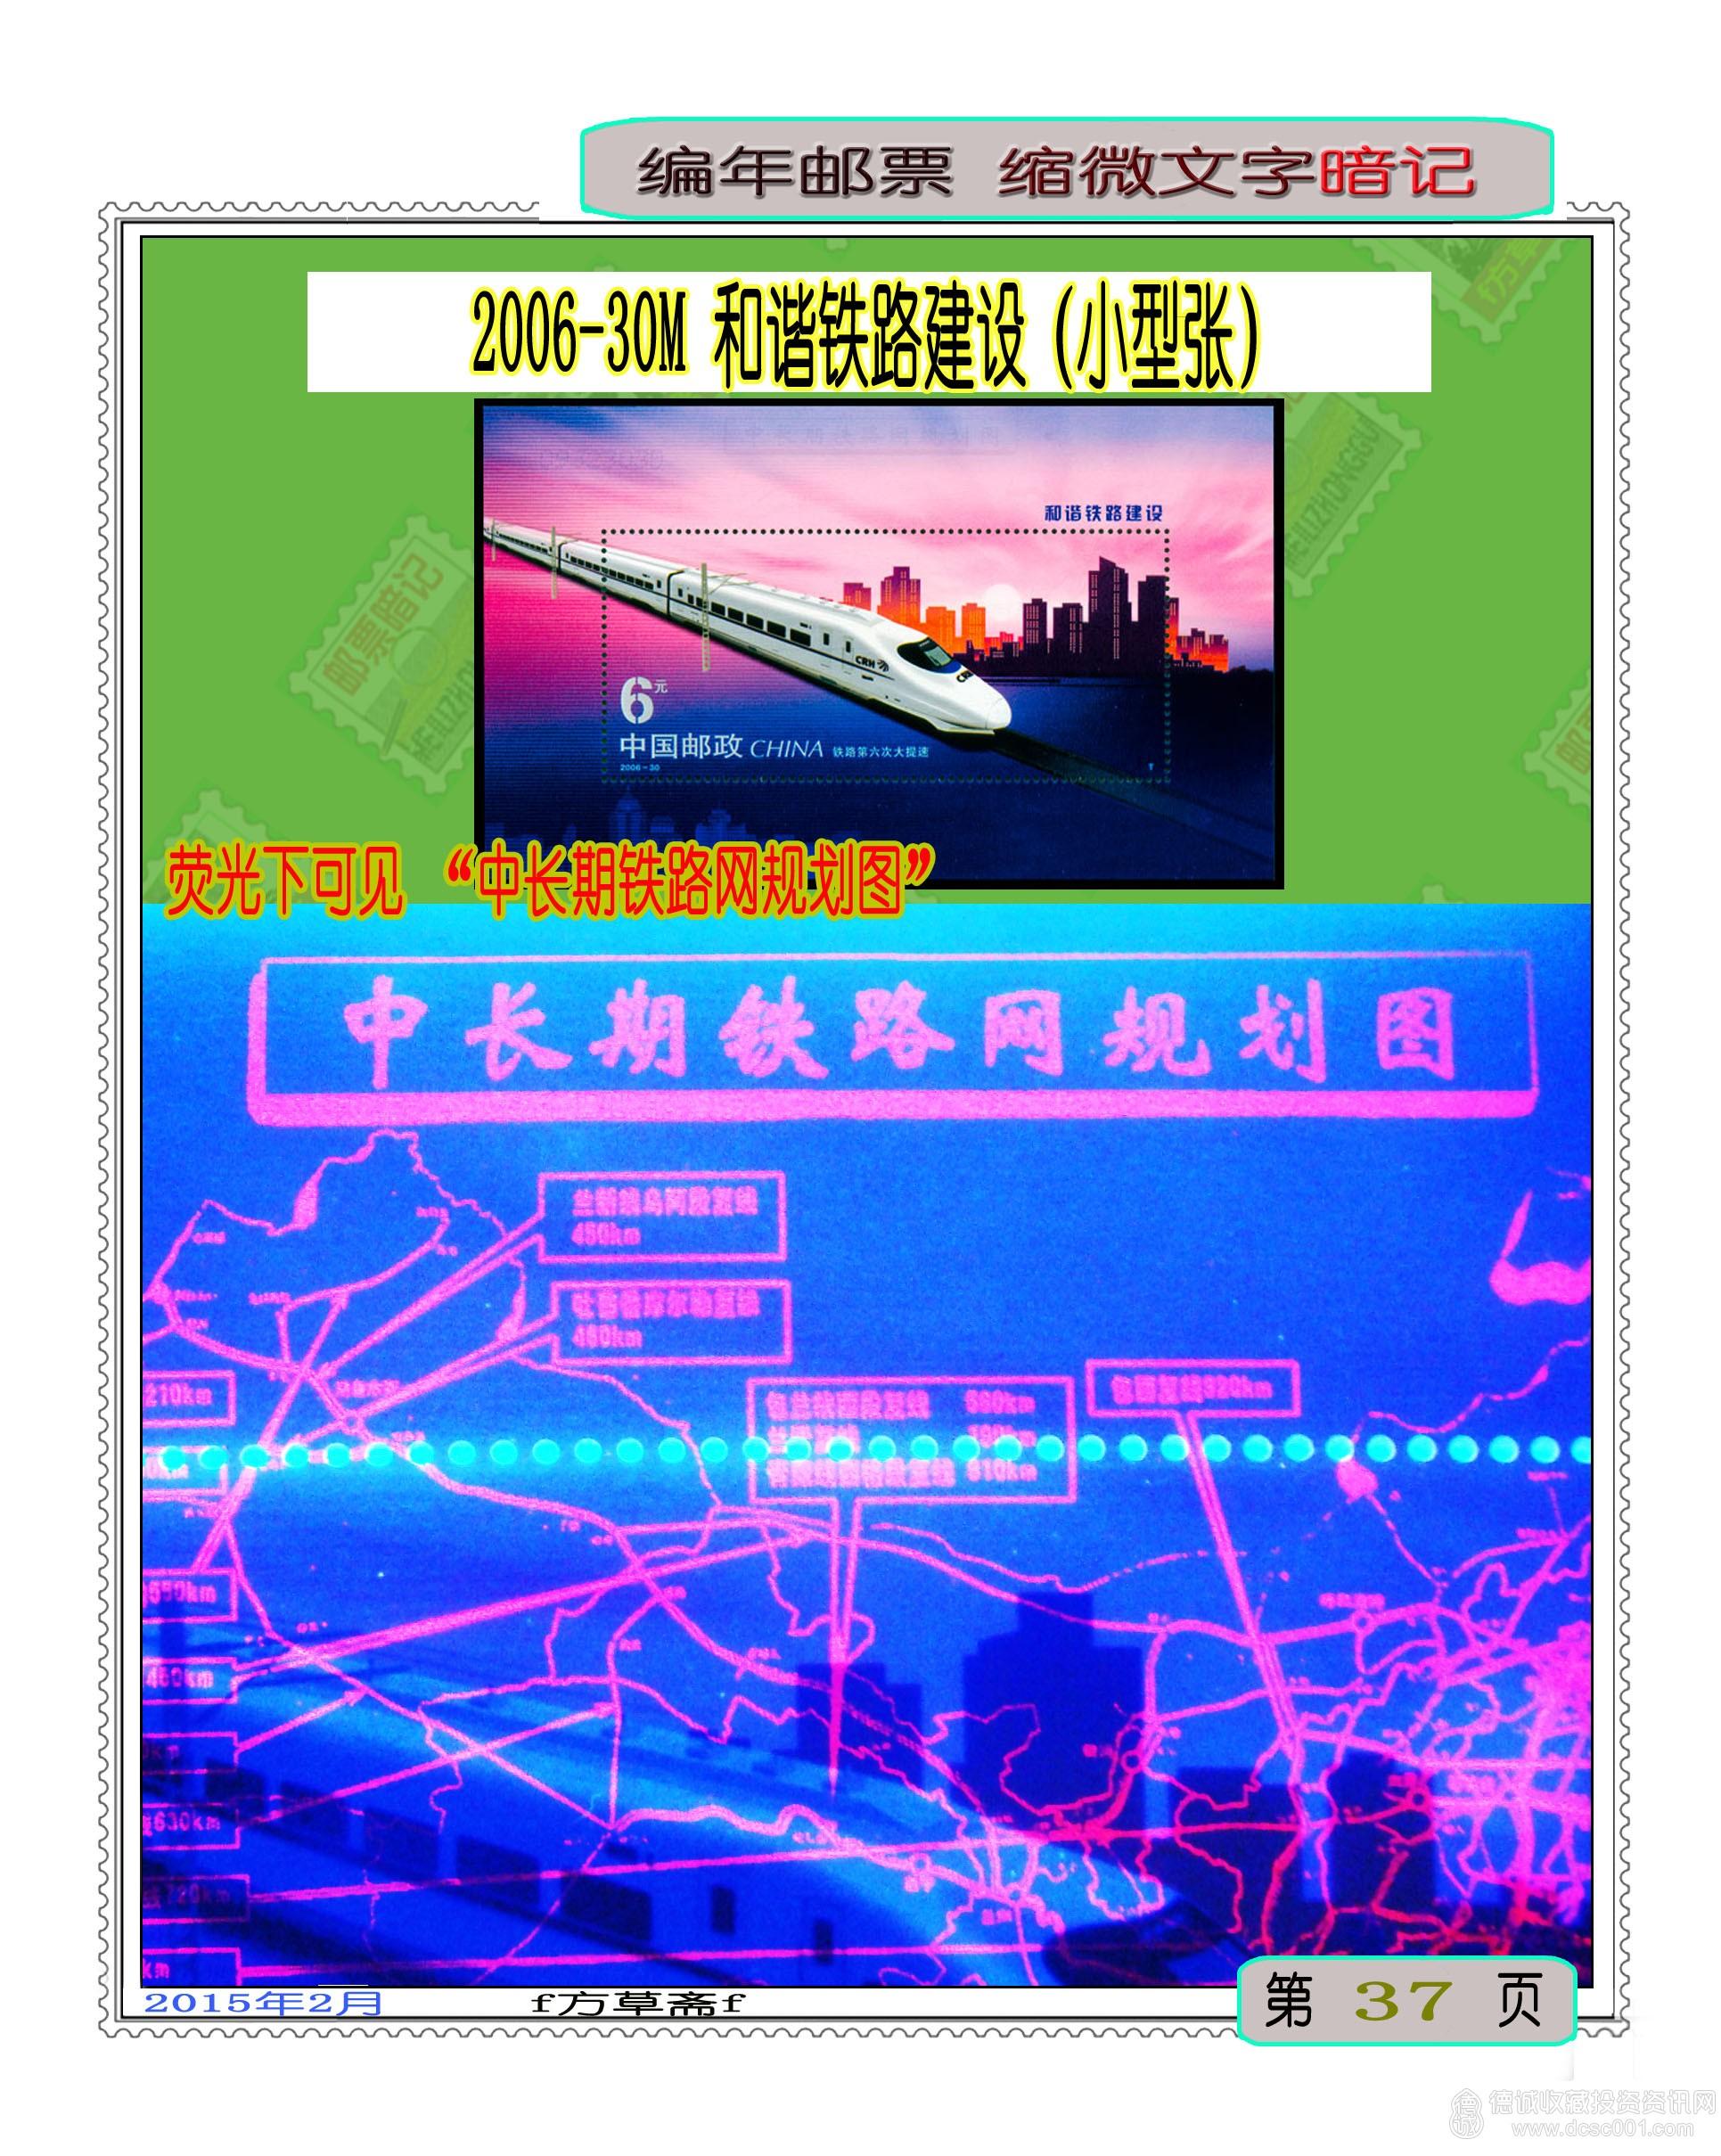 2006-30M 和谐铁路建设(小型张).JPG